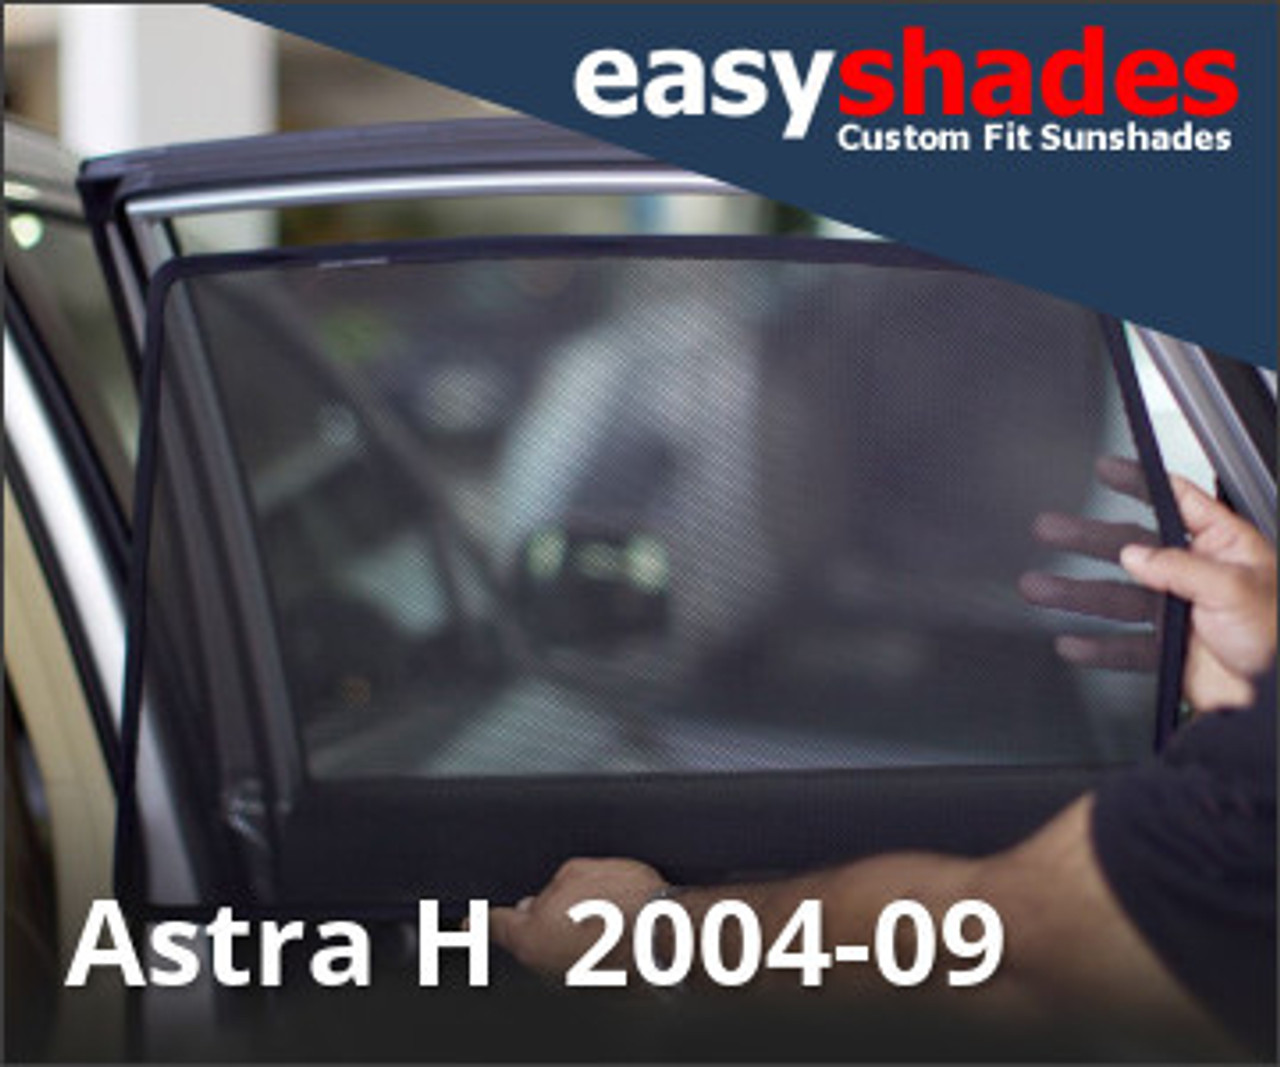 Astra H 2004-09